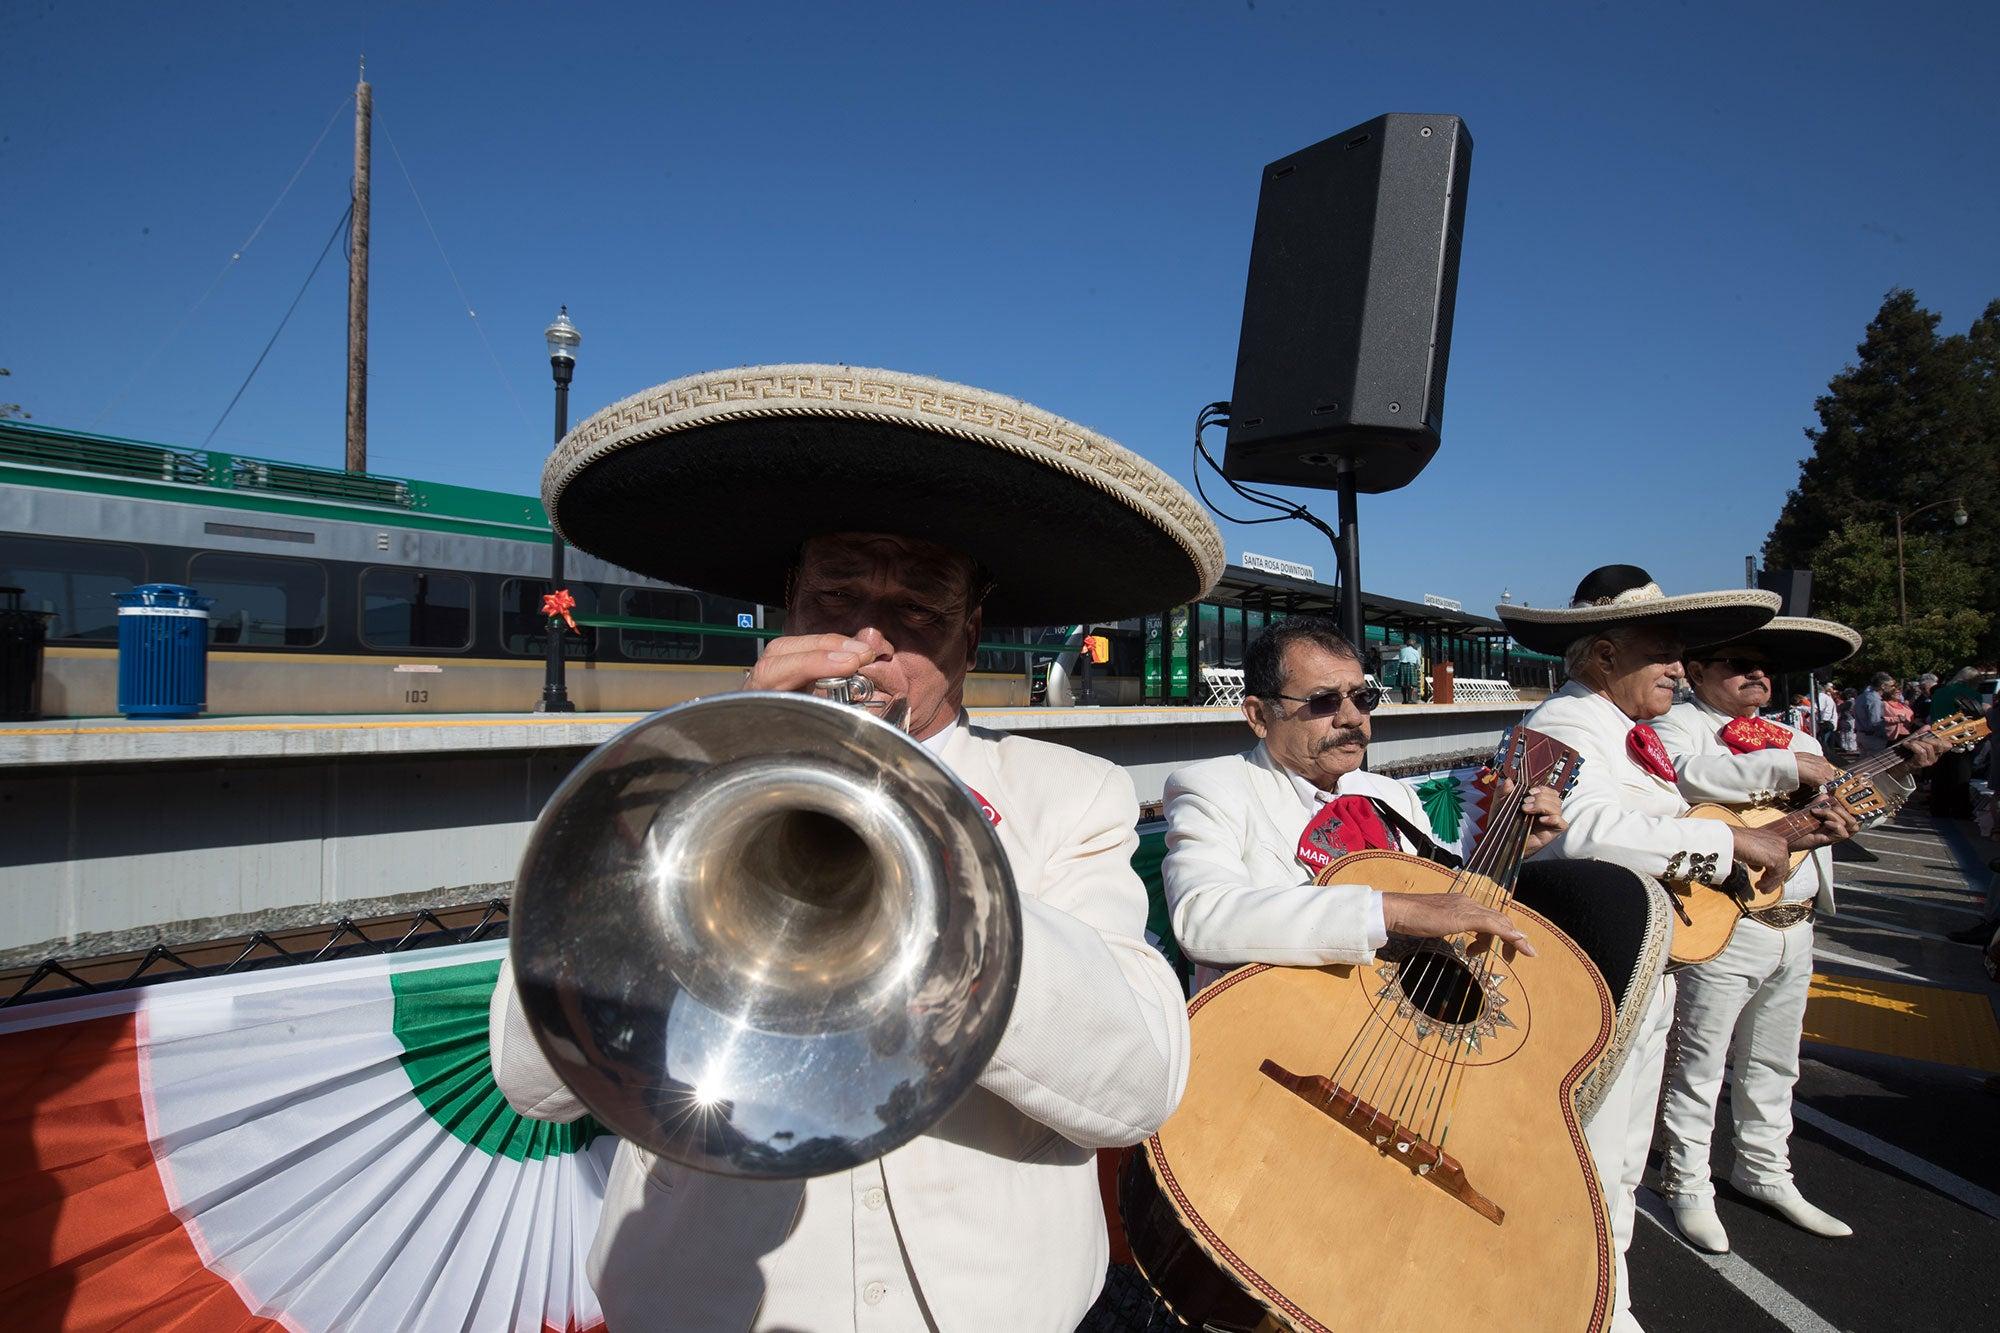 mariachi horn player